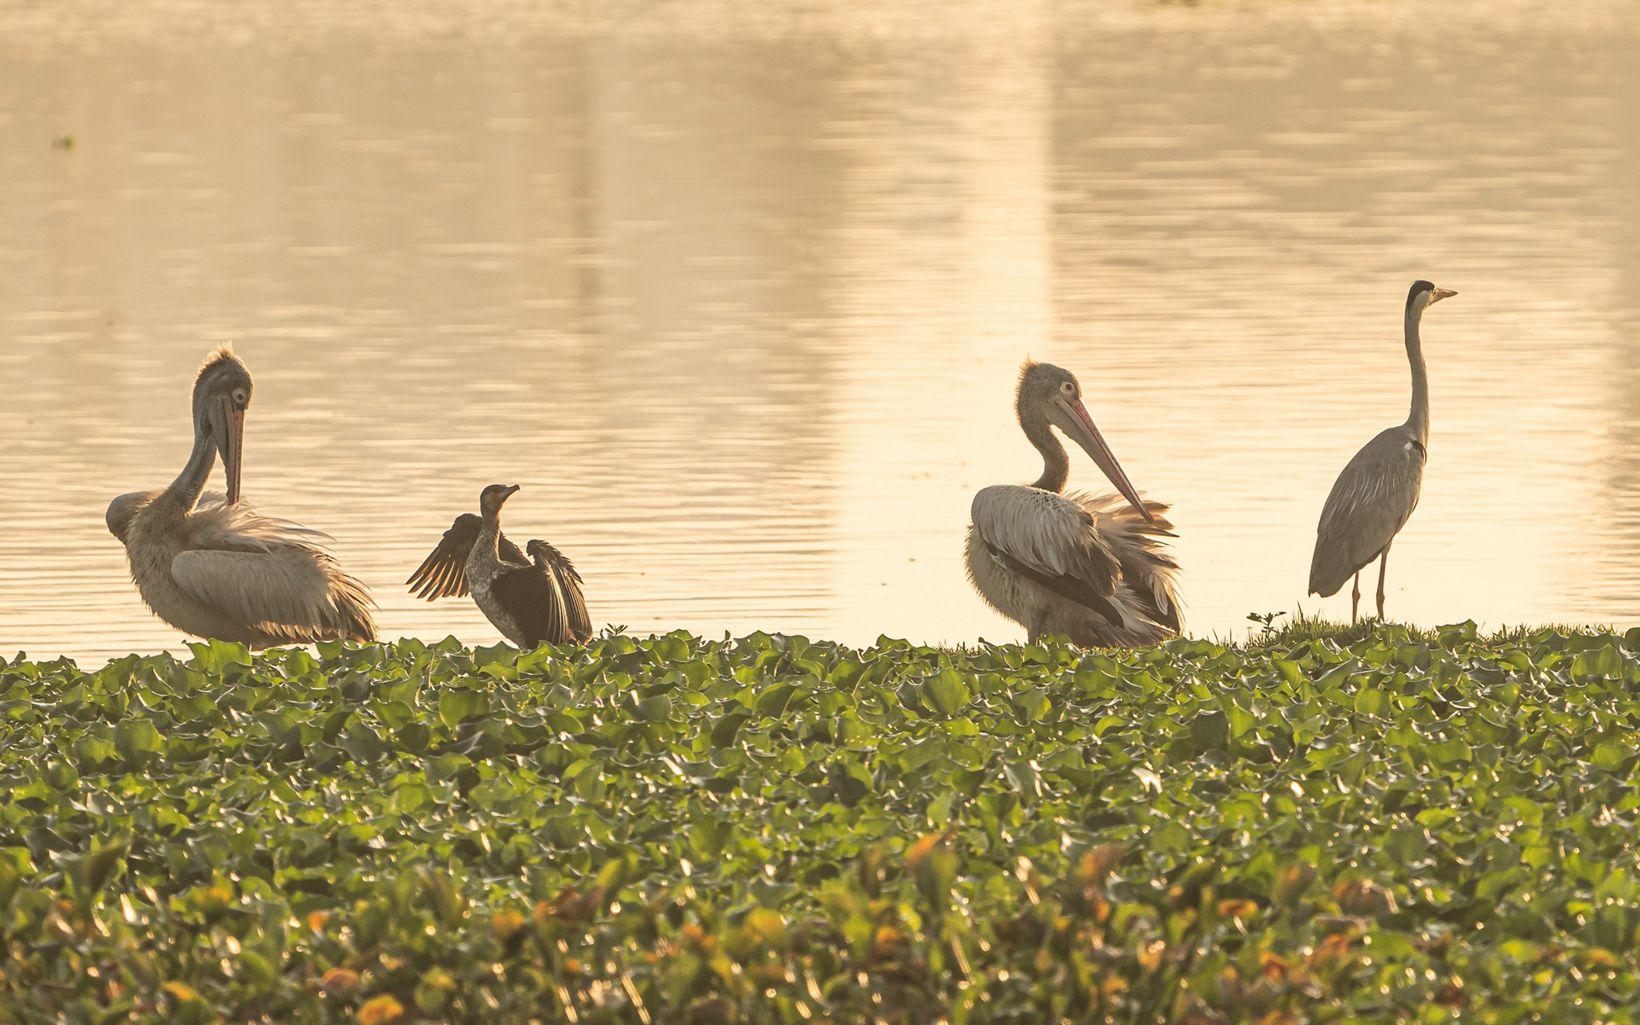 (Spot-billed Pelicans, Little Cormorants & a Grey Heron) enjoying the sunset at Lake Sembakkam